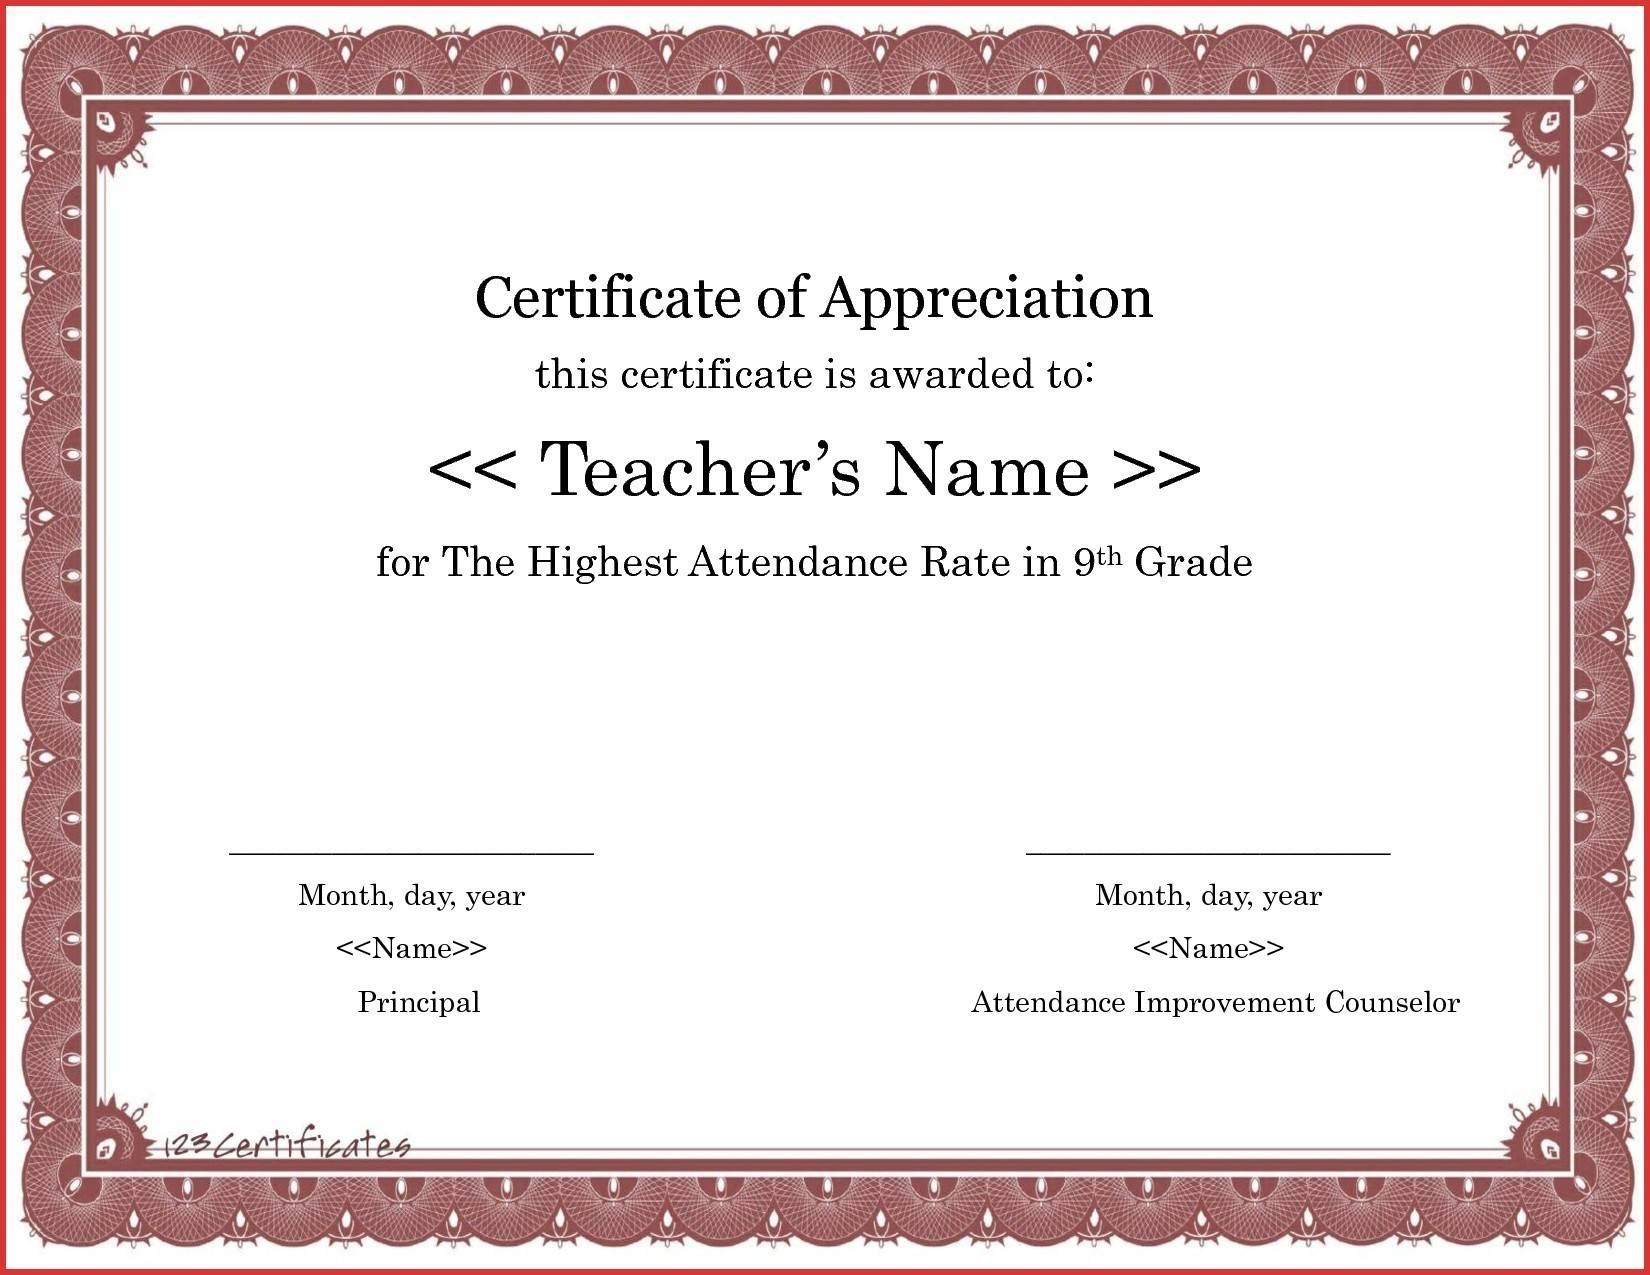 Sample Certificate Of Appreciation For Judges